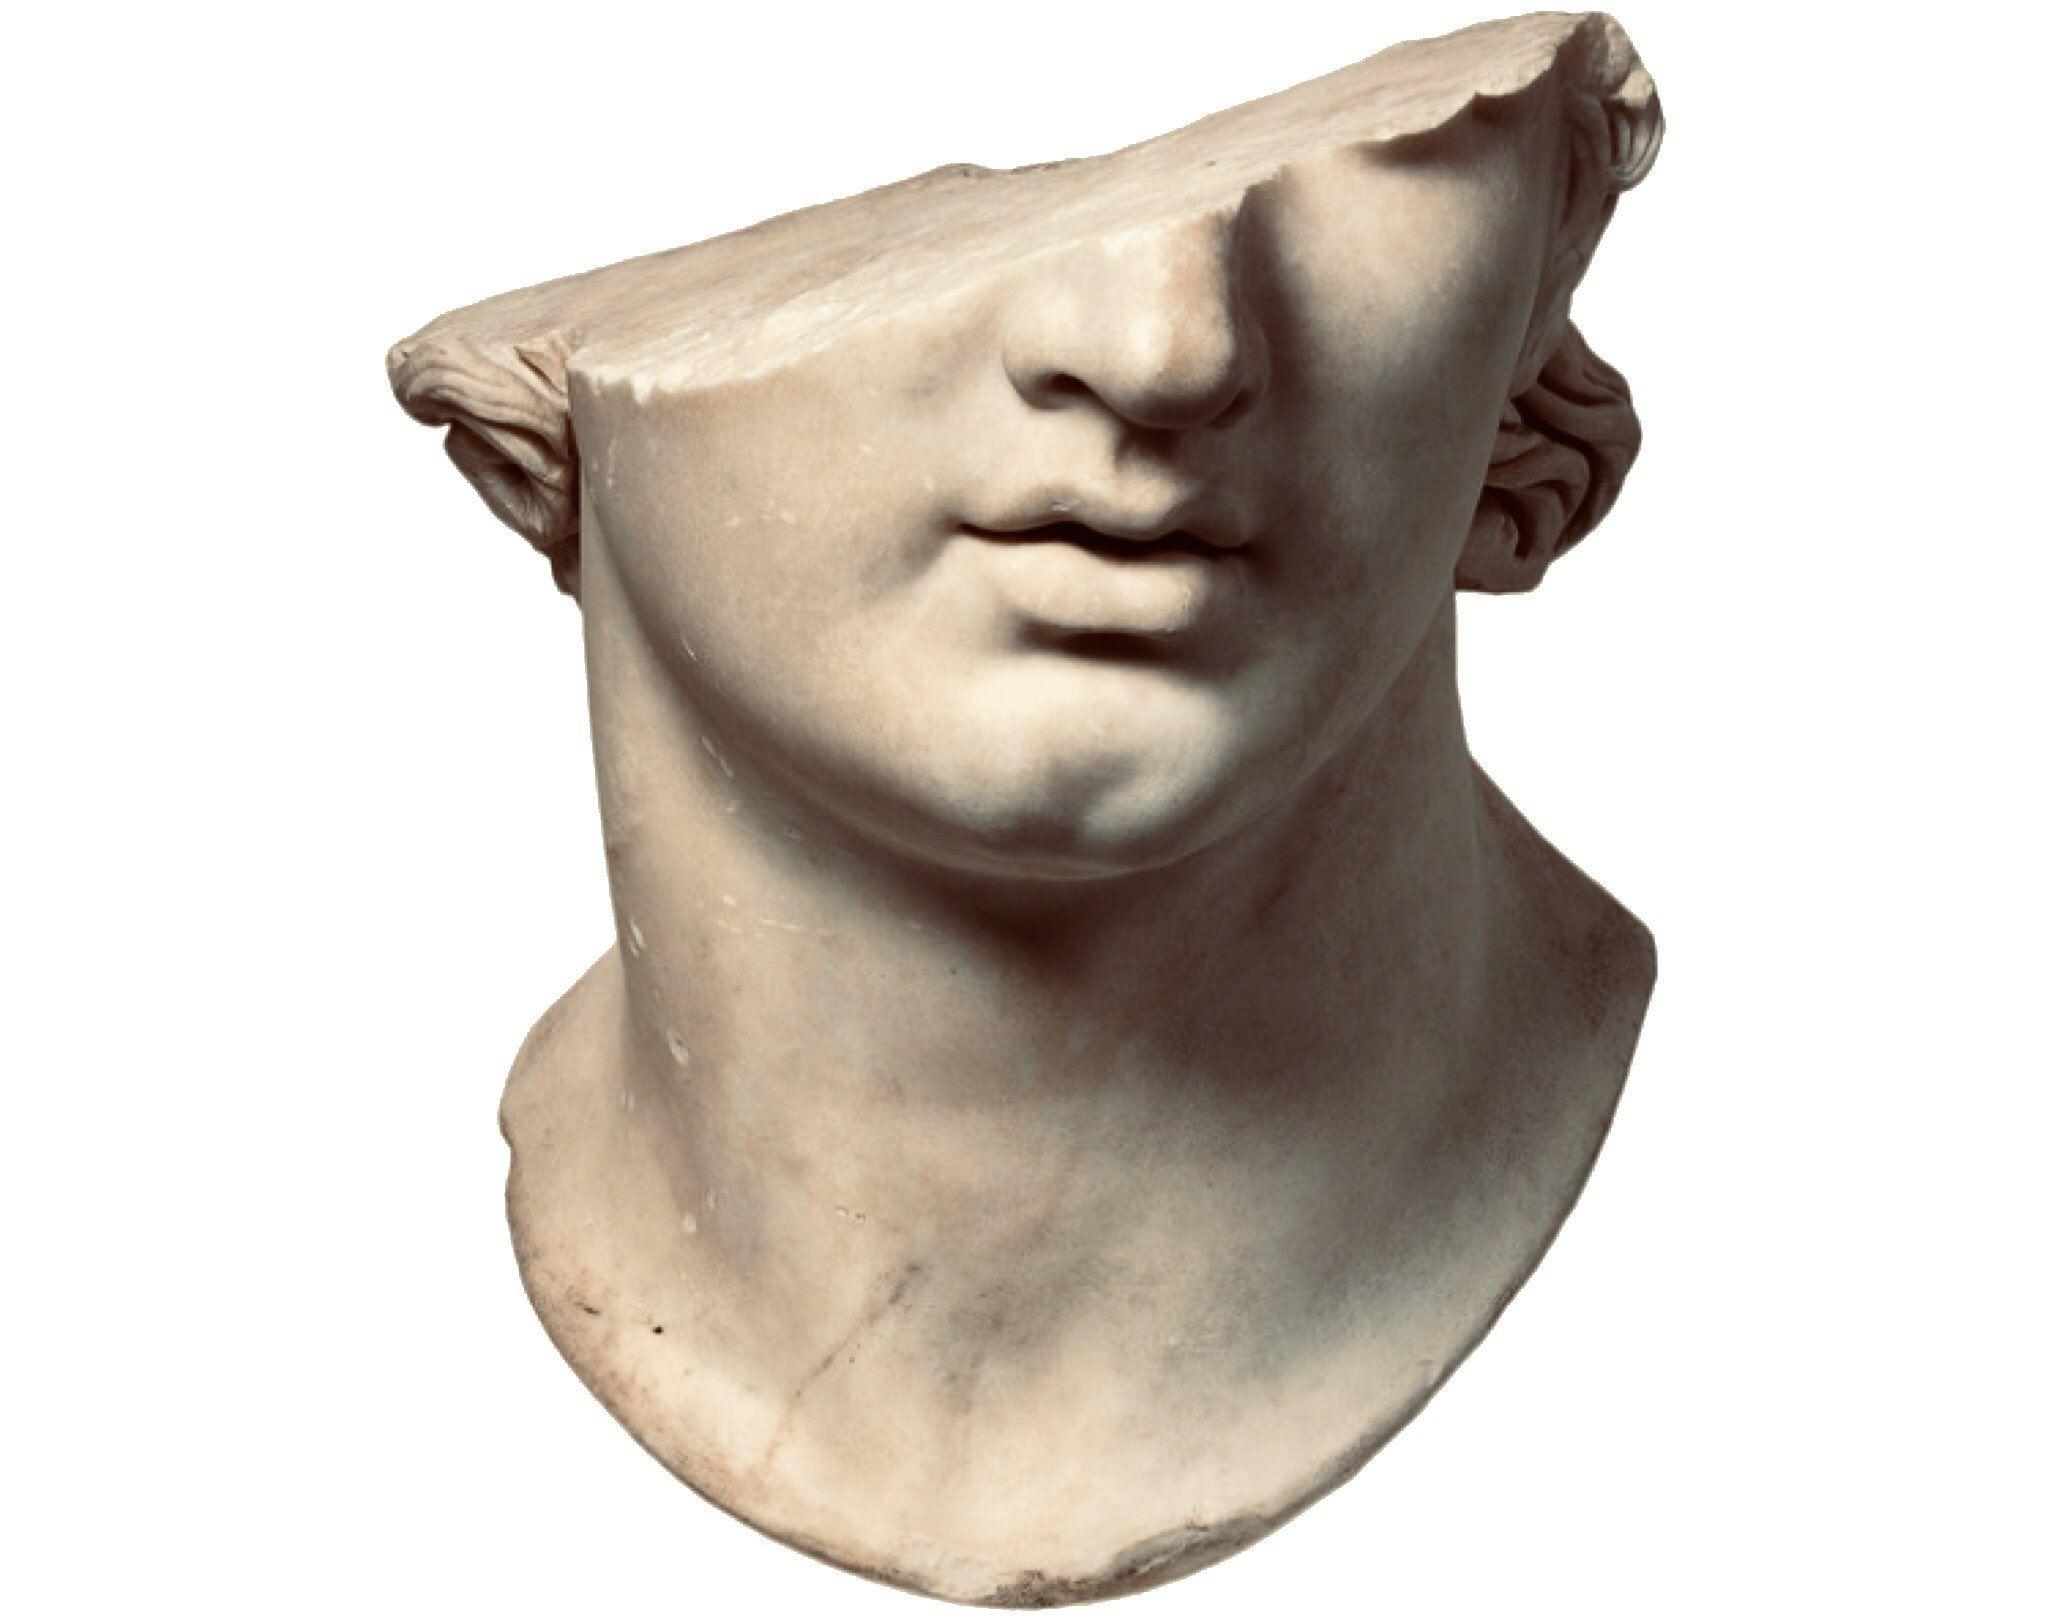 Gareth Harney On Twitter In 2021 Statue Art Exhibition Collage Design